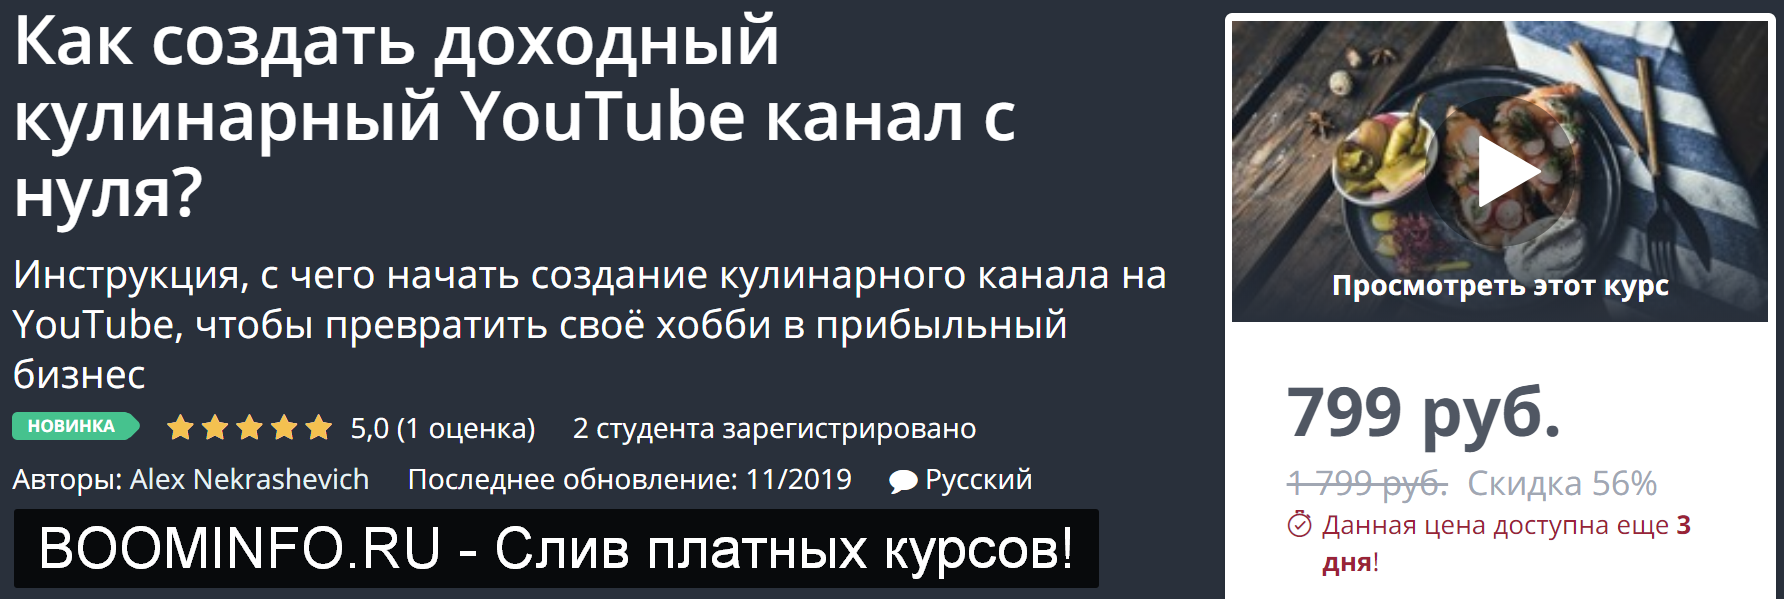 2019-12-02_12-45-33